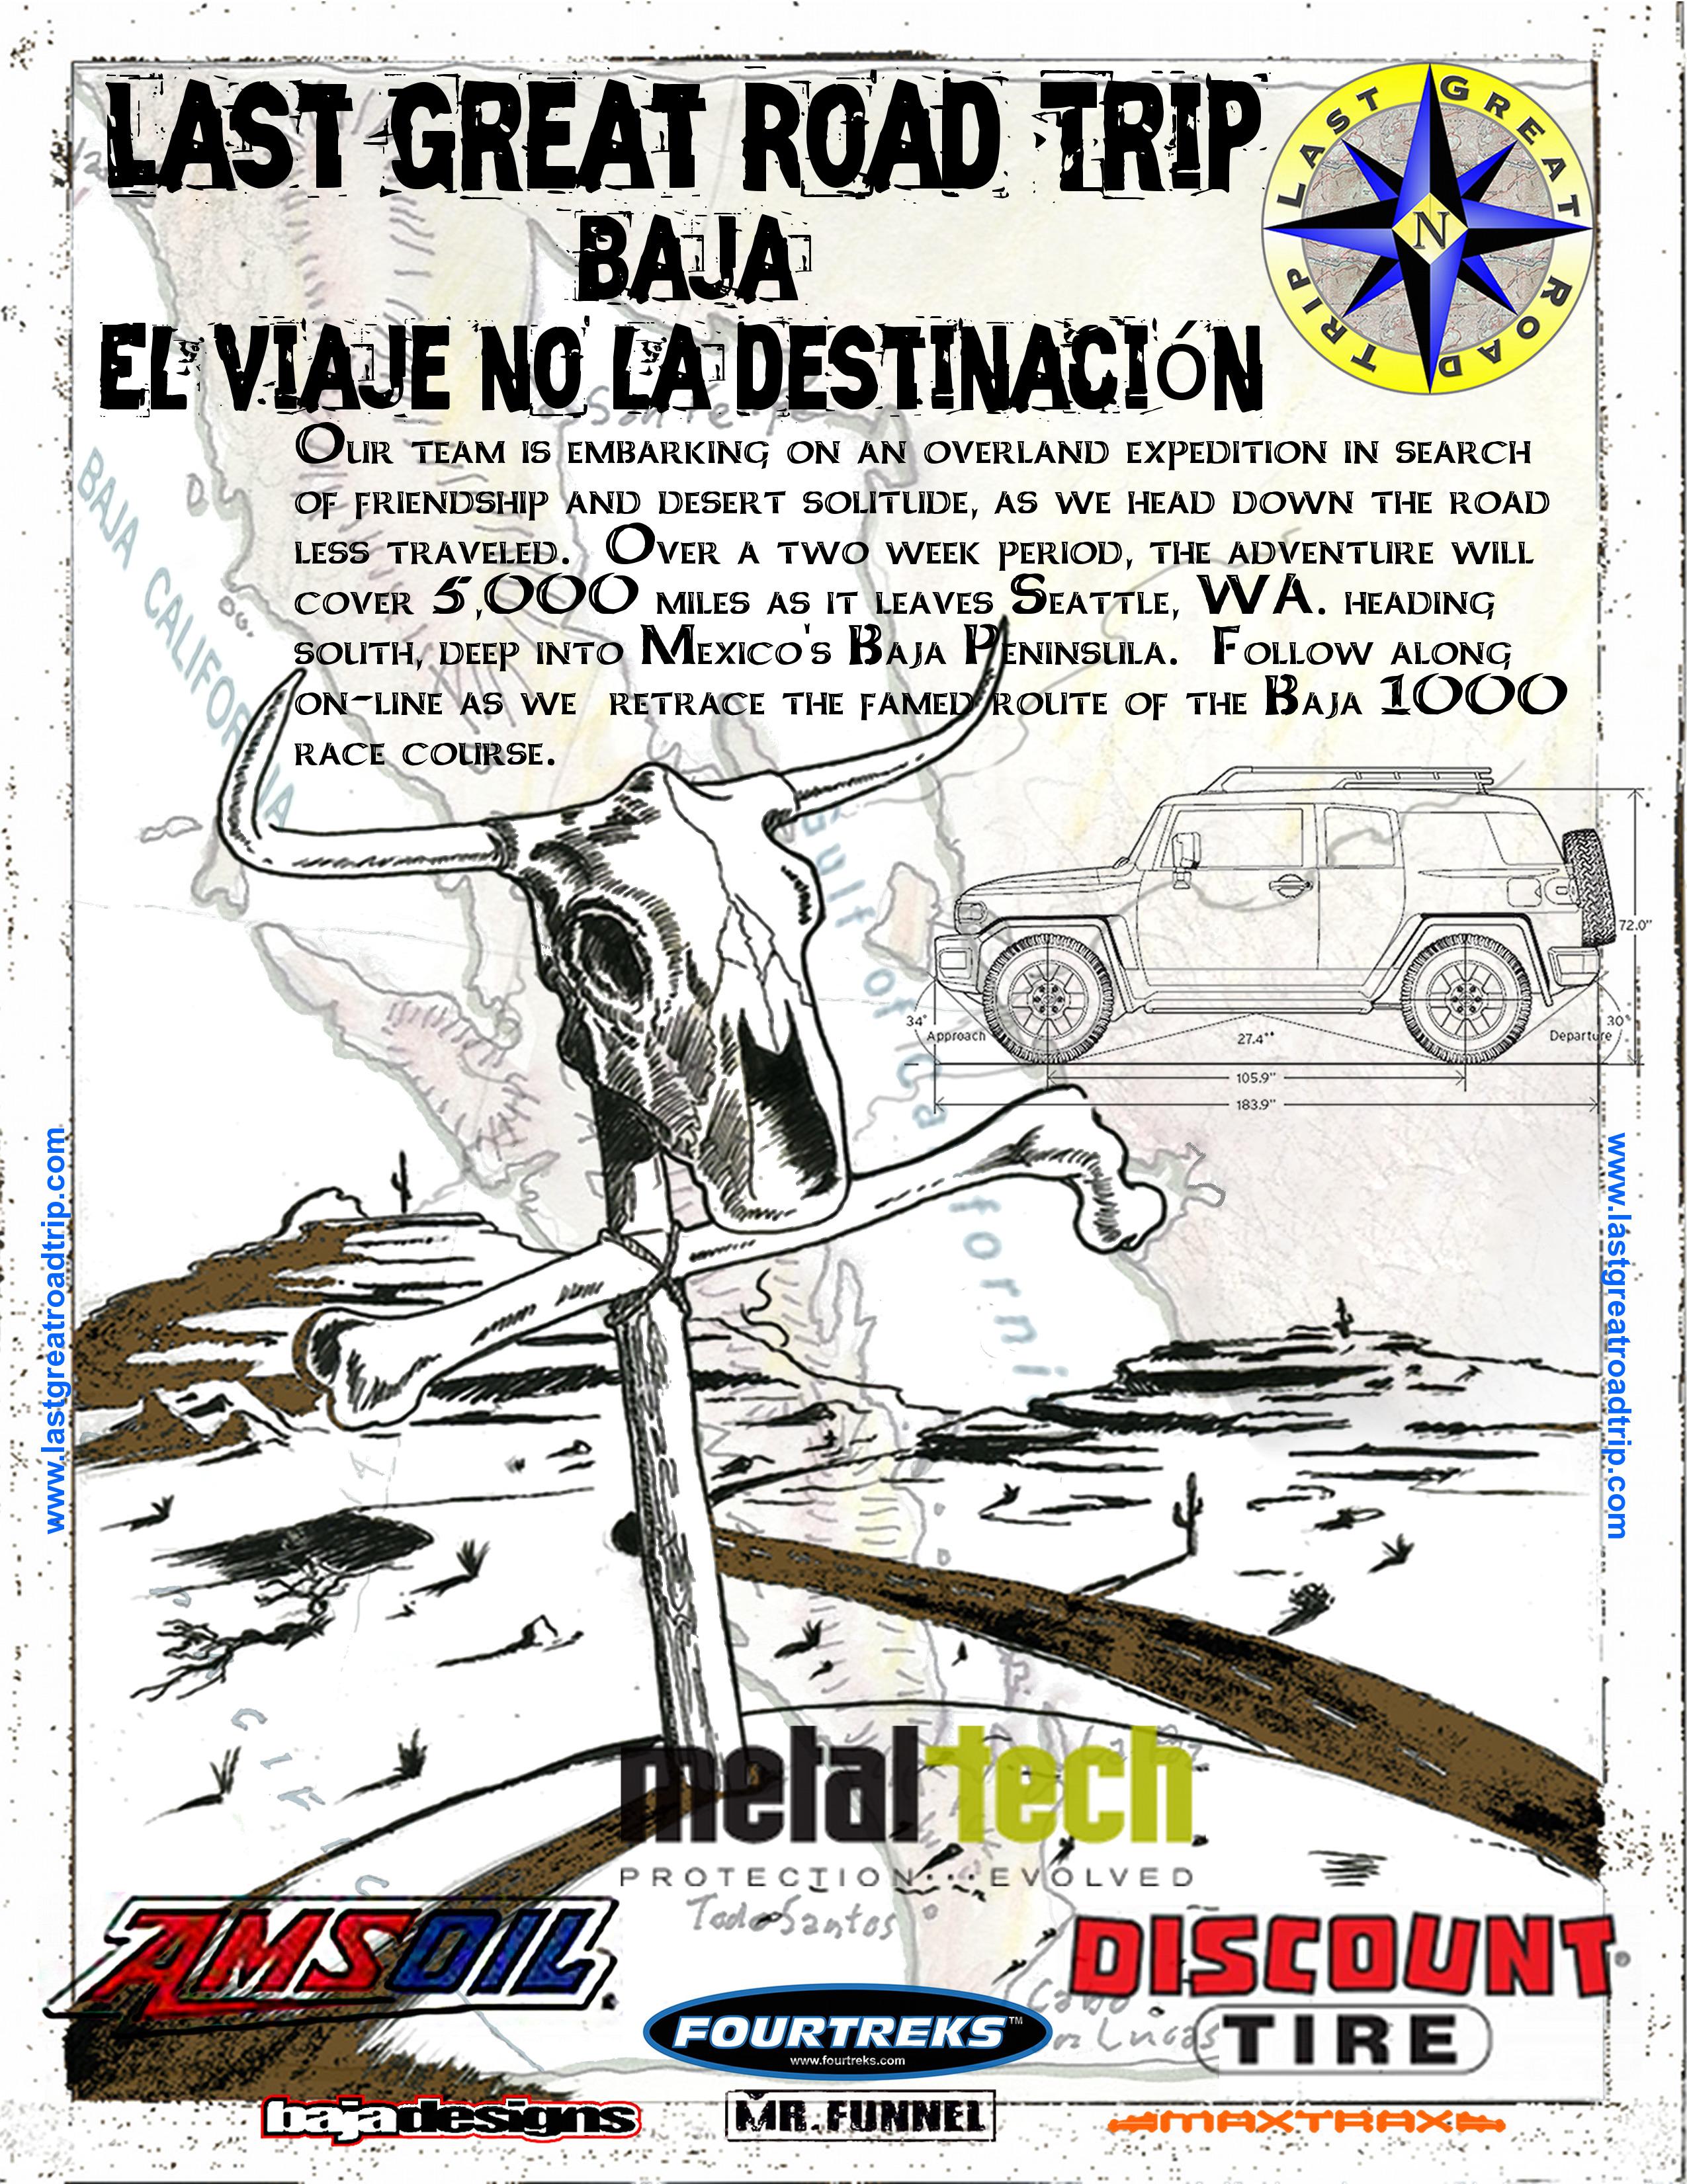 Baja Mexico Off Road Adventure Poster